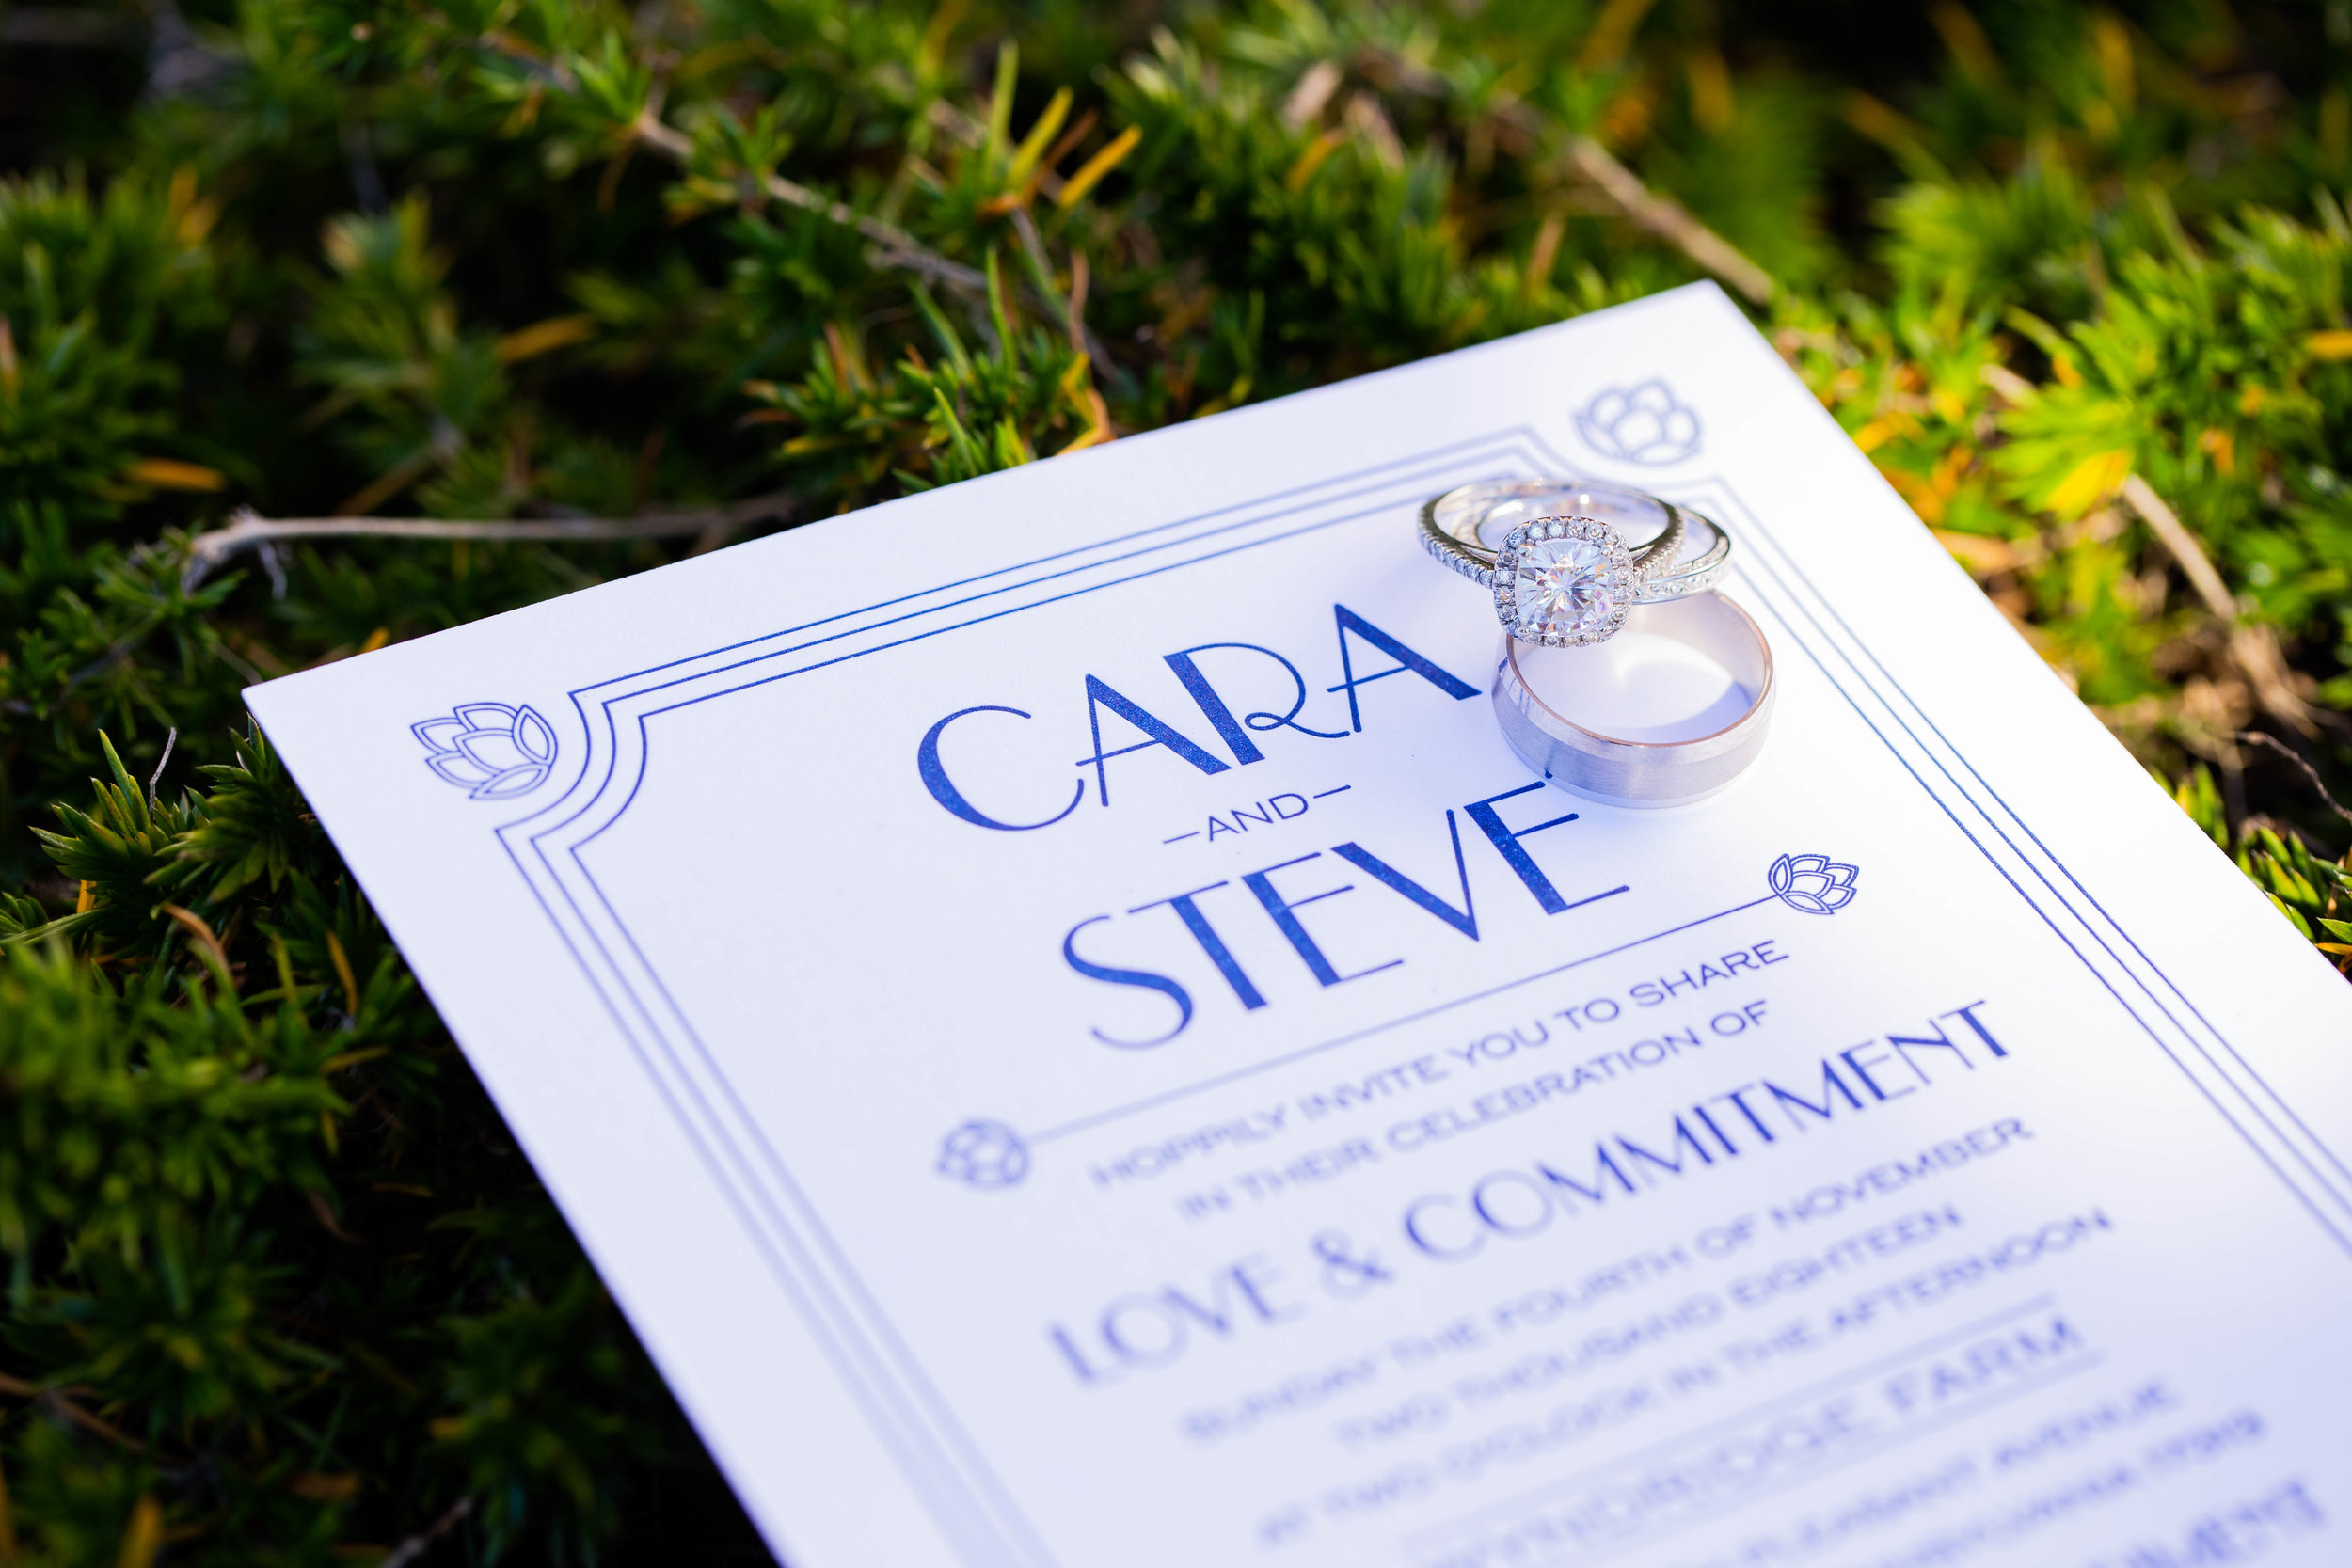 Cara & Steve Wedding Program